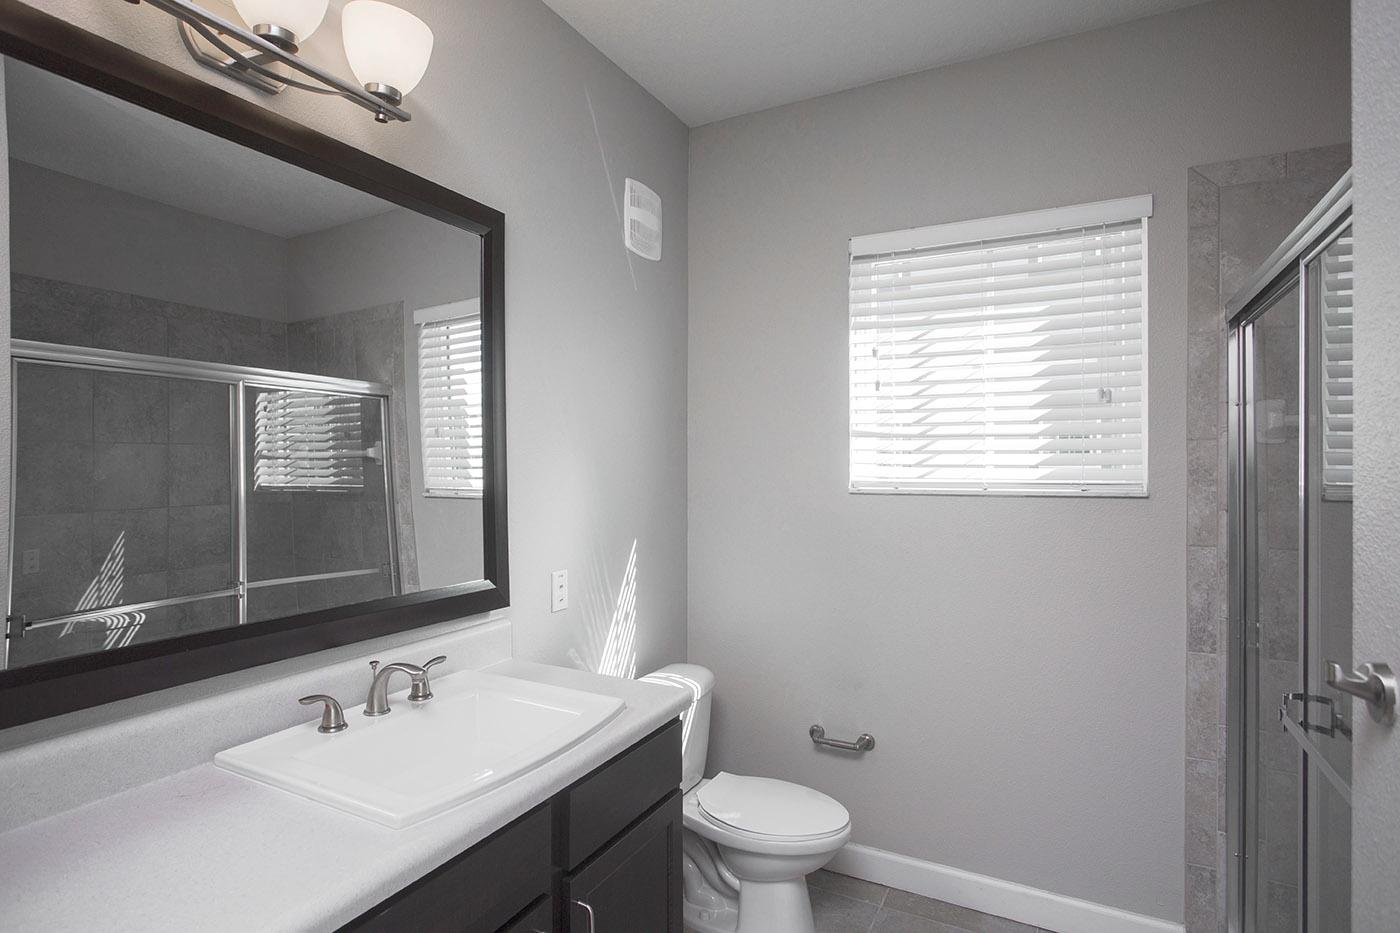 CharlestonEdge-Rental-Apartment-Brandon-Tampa-Florida-Pool-Bedrooms-Bathrooms-2.jpg